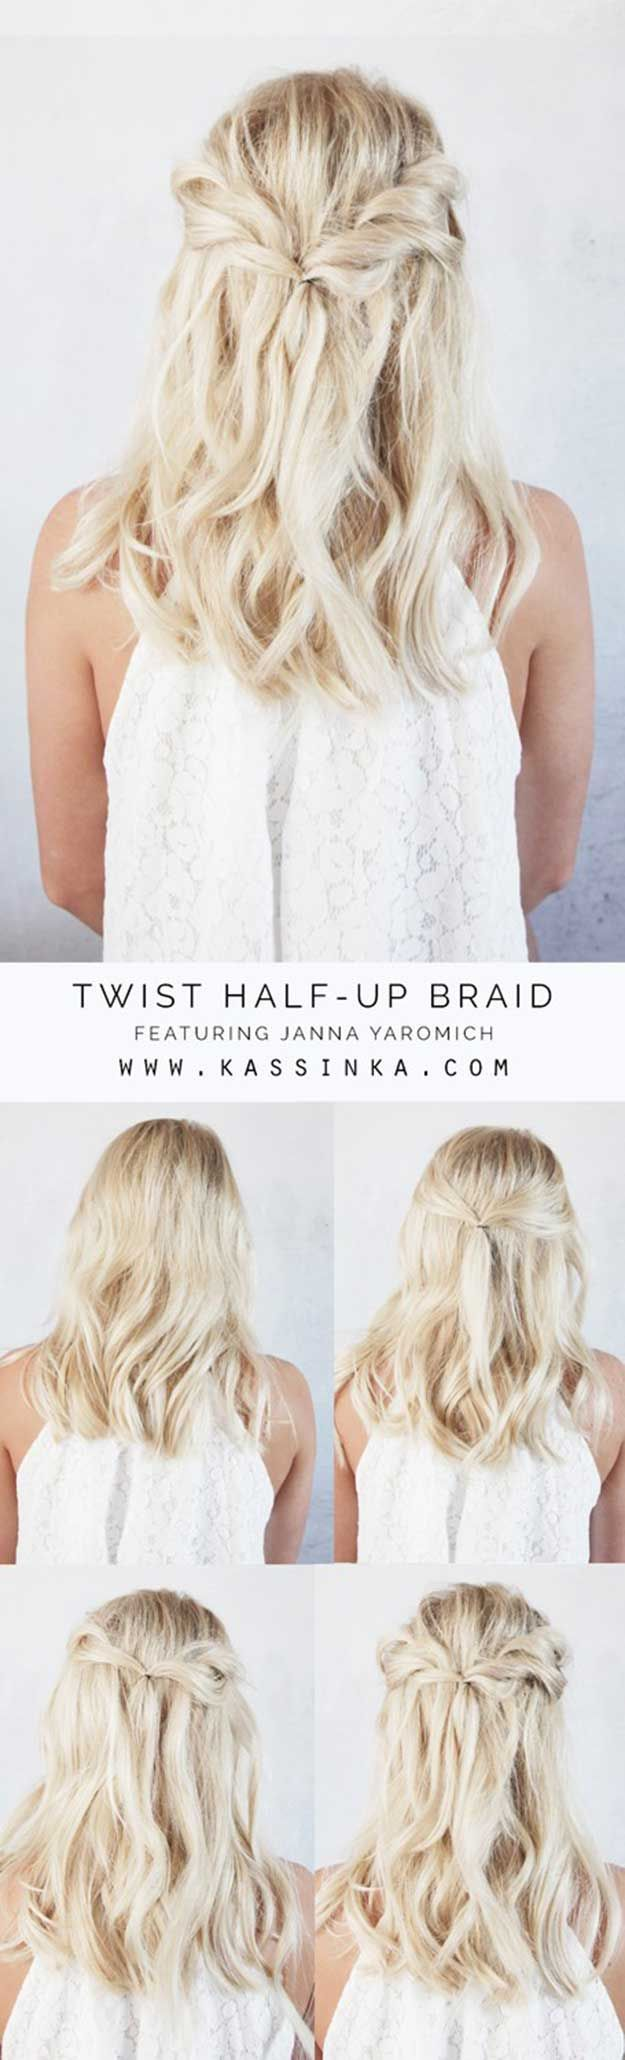 Best summer hairstyles halfup twists tutorial for short hair